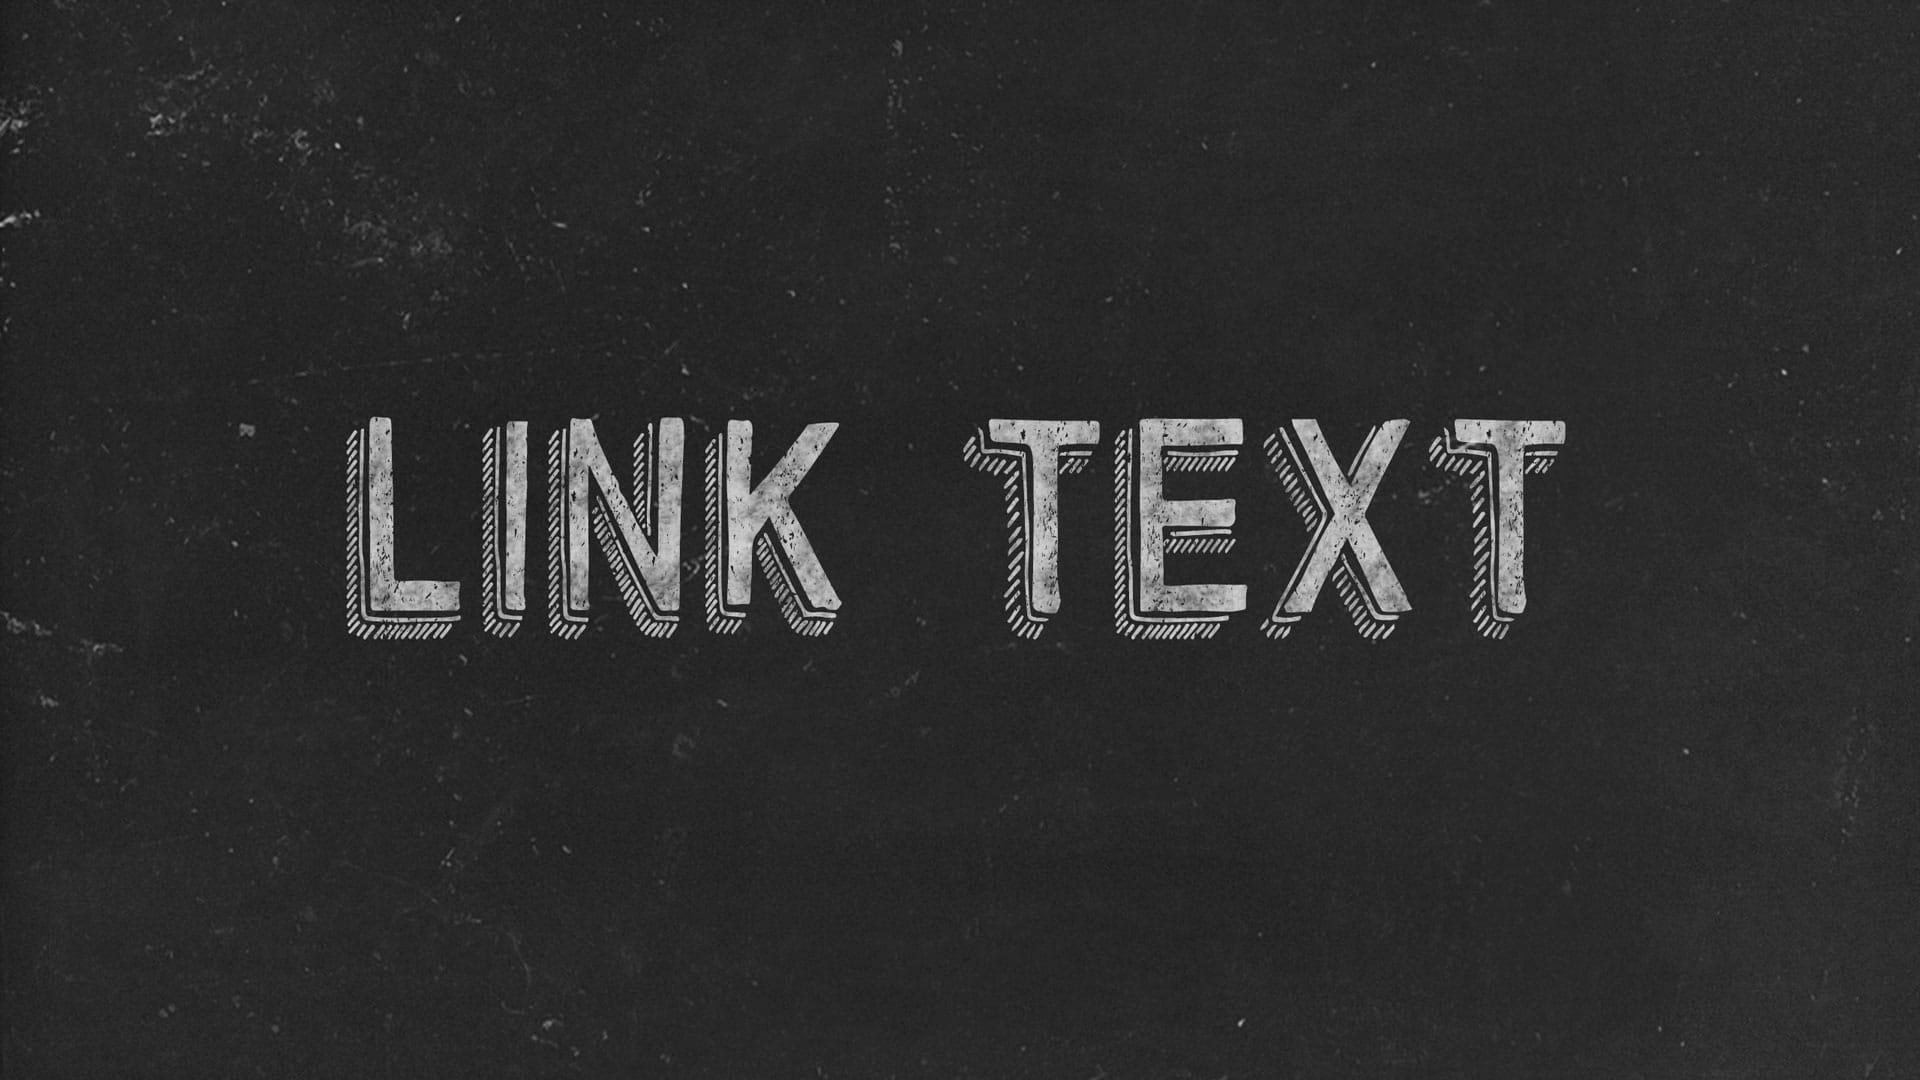 Link Text Black Image